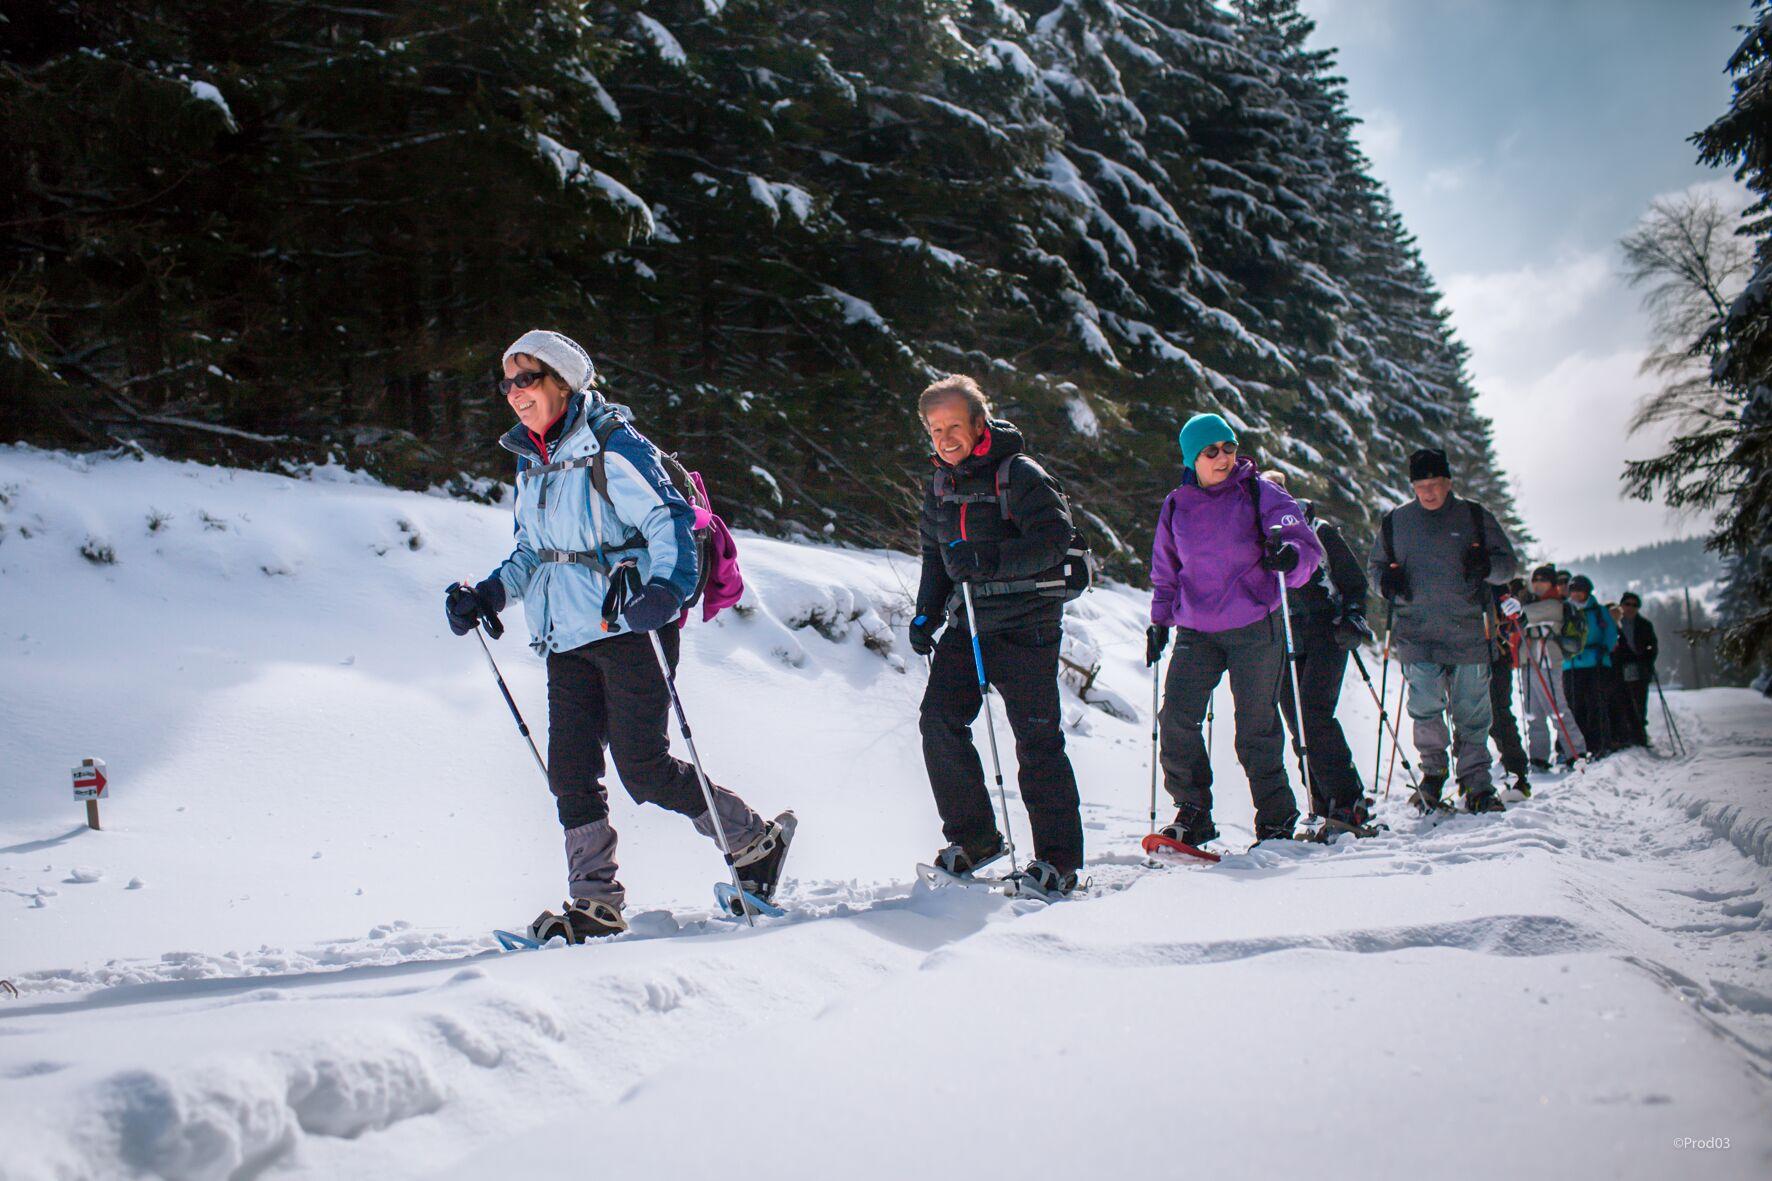 praboure-station-de-ski-hiver-randonnee-ski-de-fond